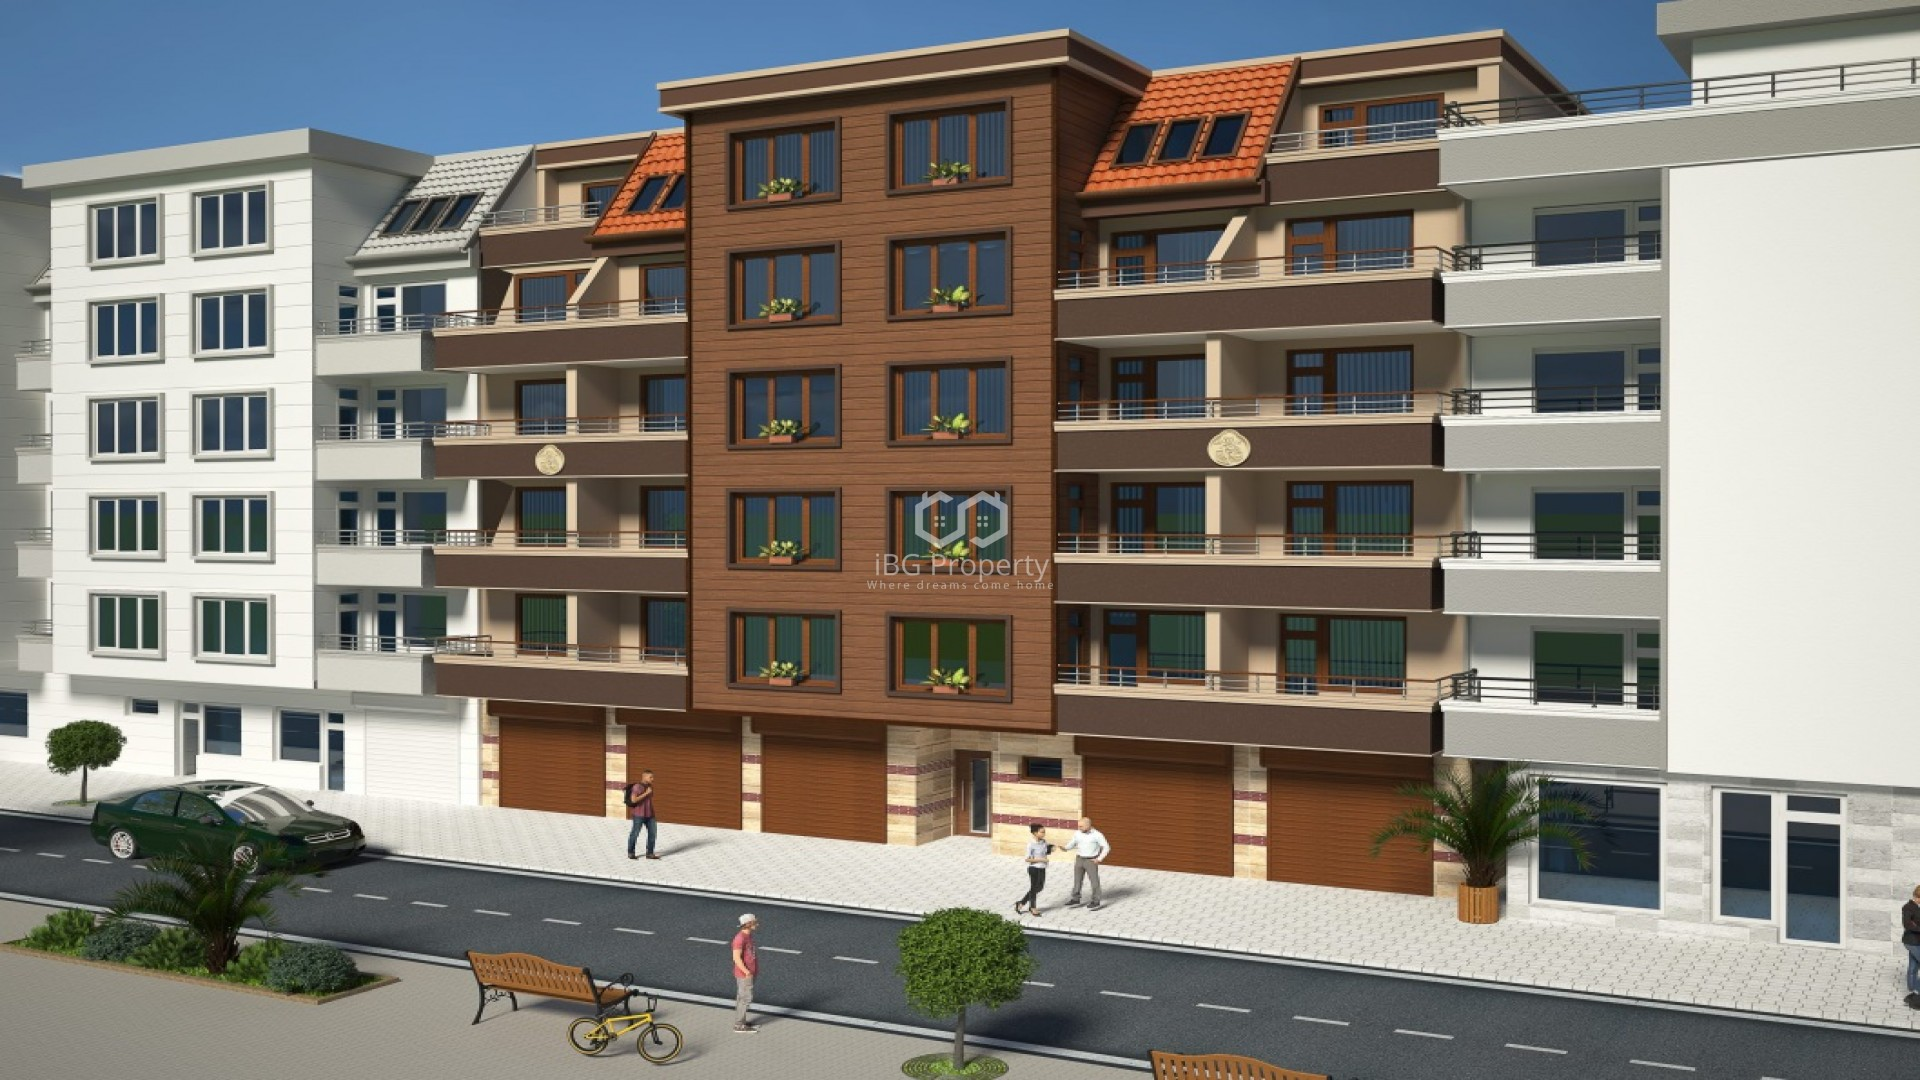 Двухкомнатная квартира Поморие 48 m2